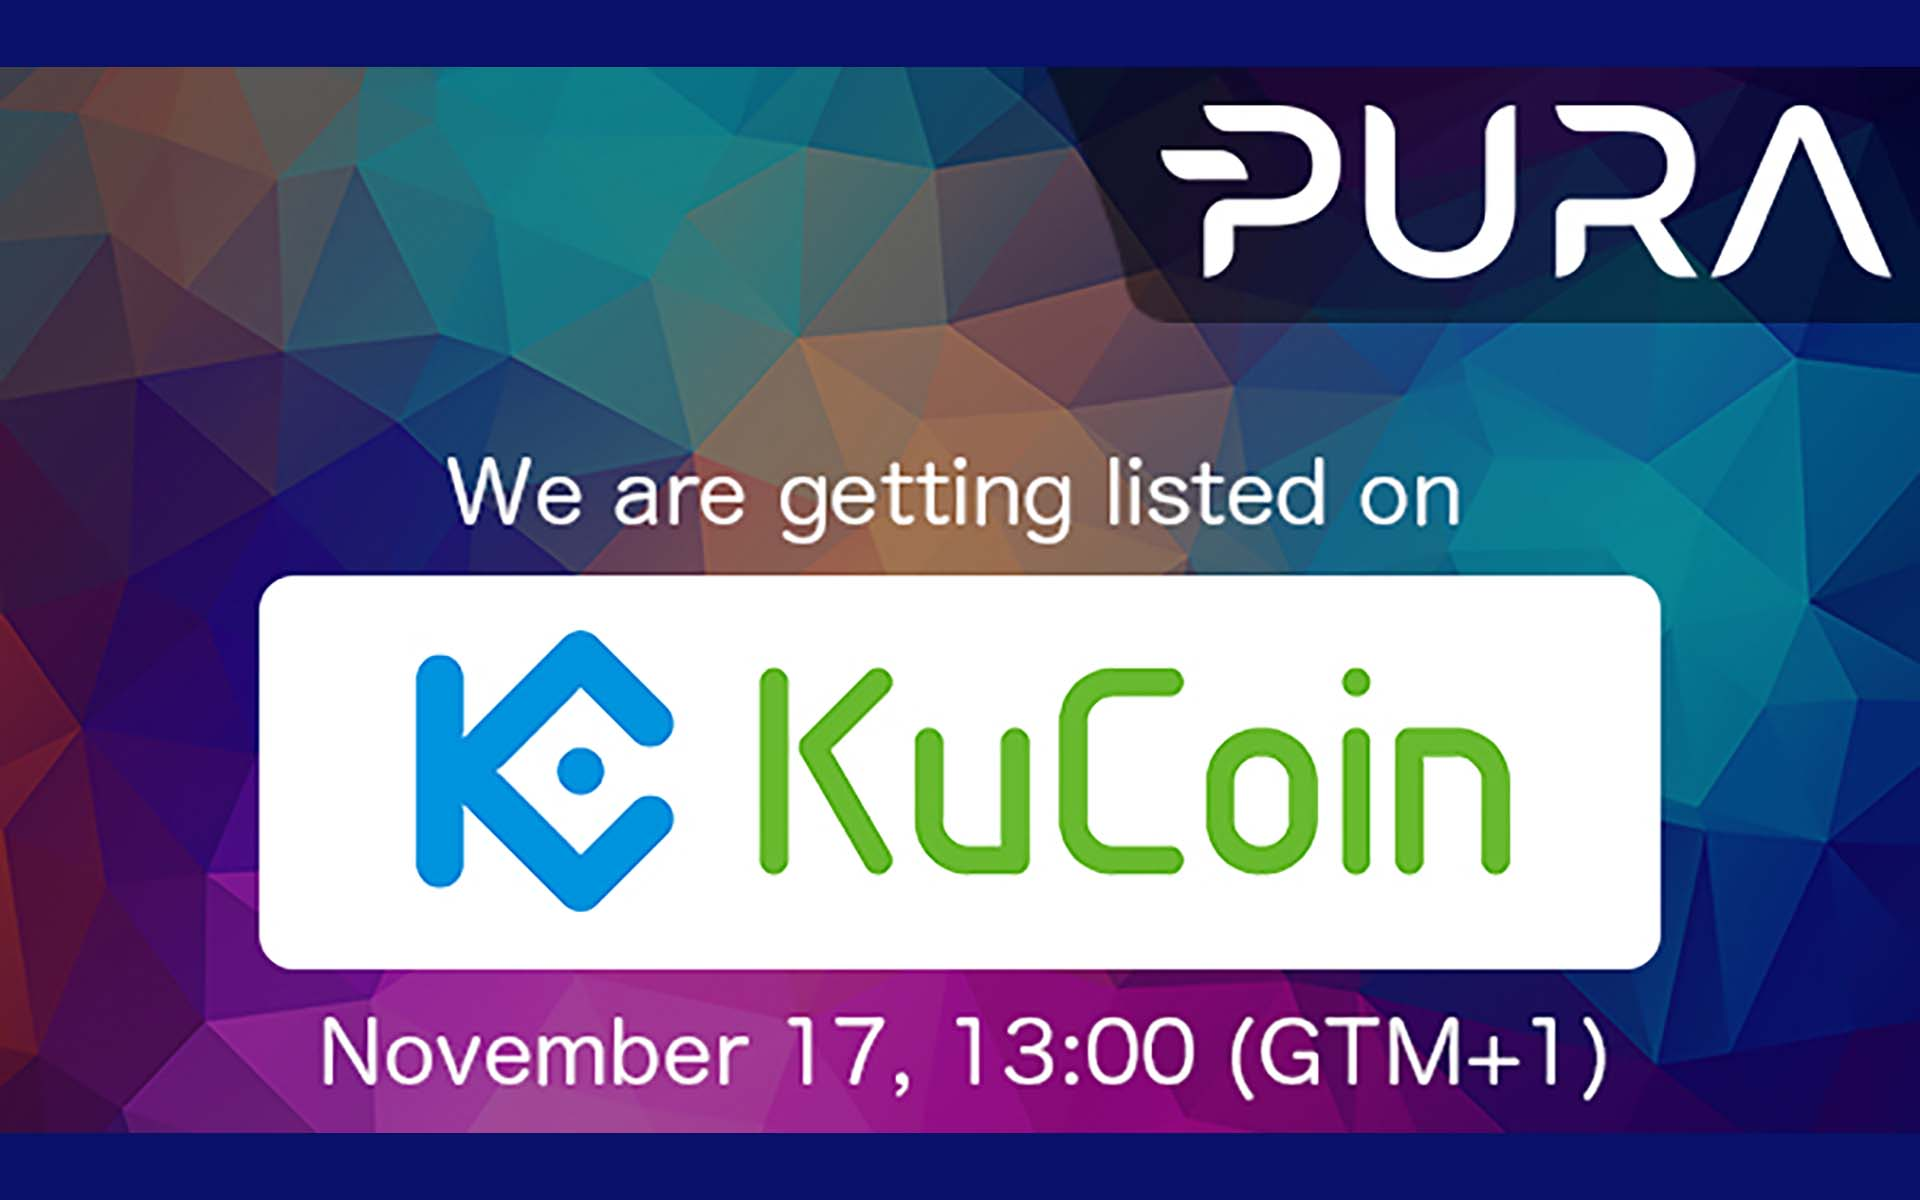 PURA to be listed on KuCoin: Trading Starts On Friday November 17